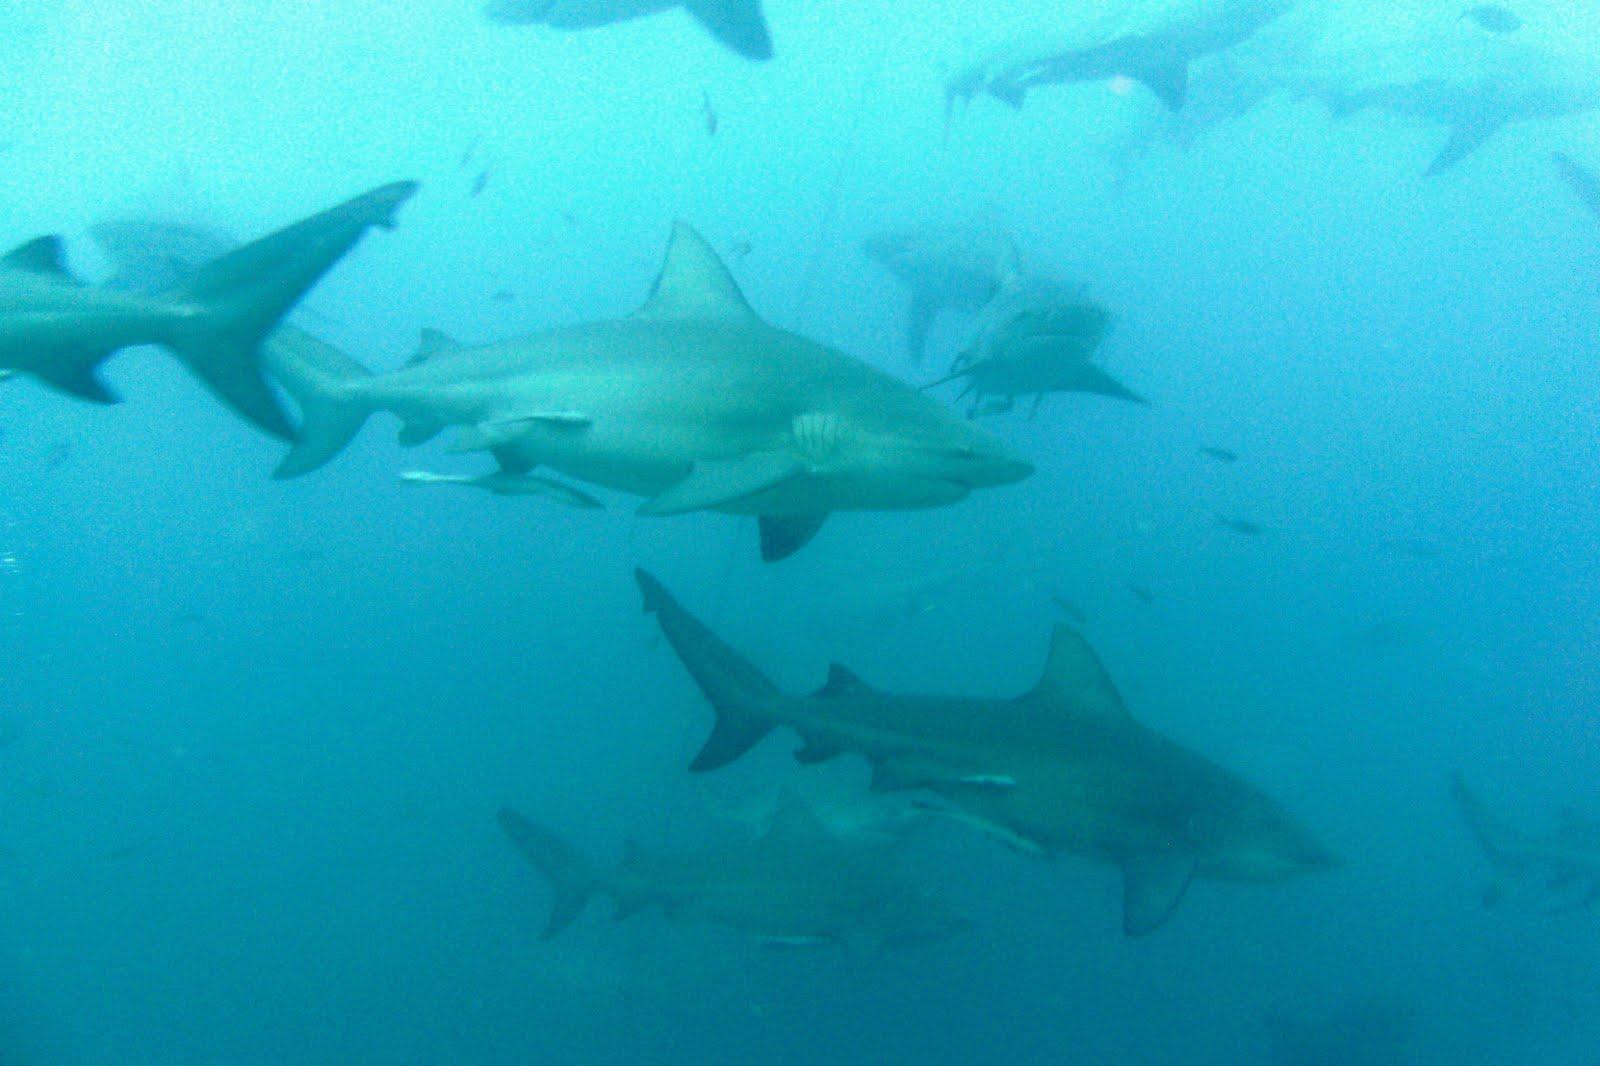 Big Fishes of the World: SHARK BULL (Carcharinus leucas) |Worlds Largest Bull Shark